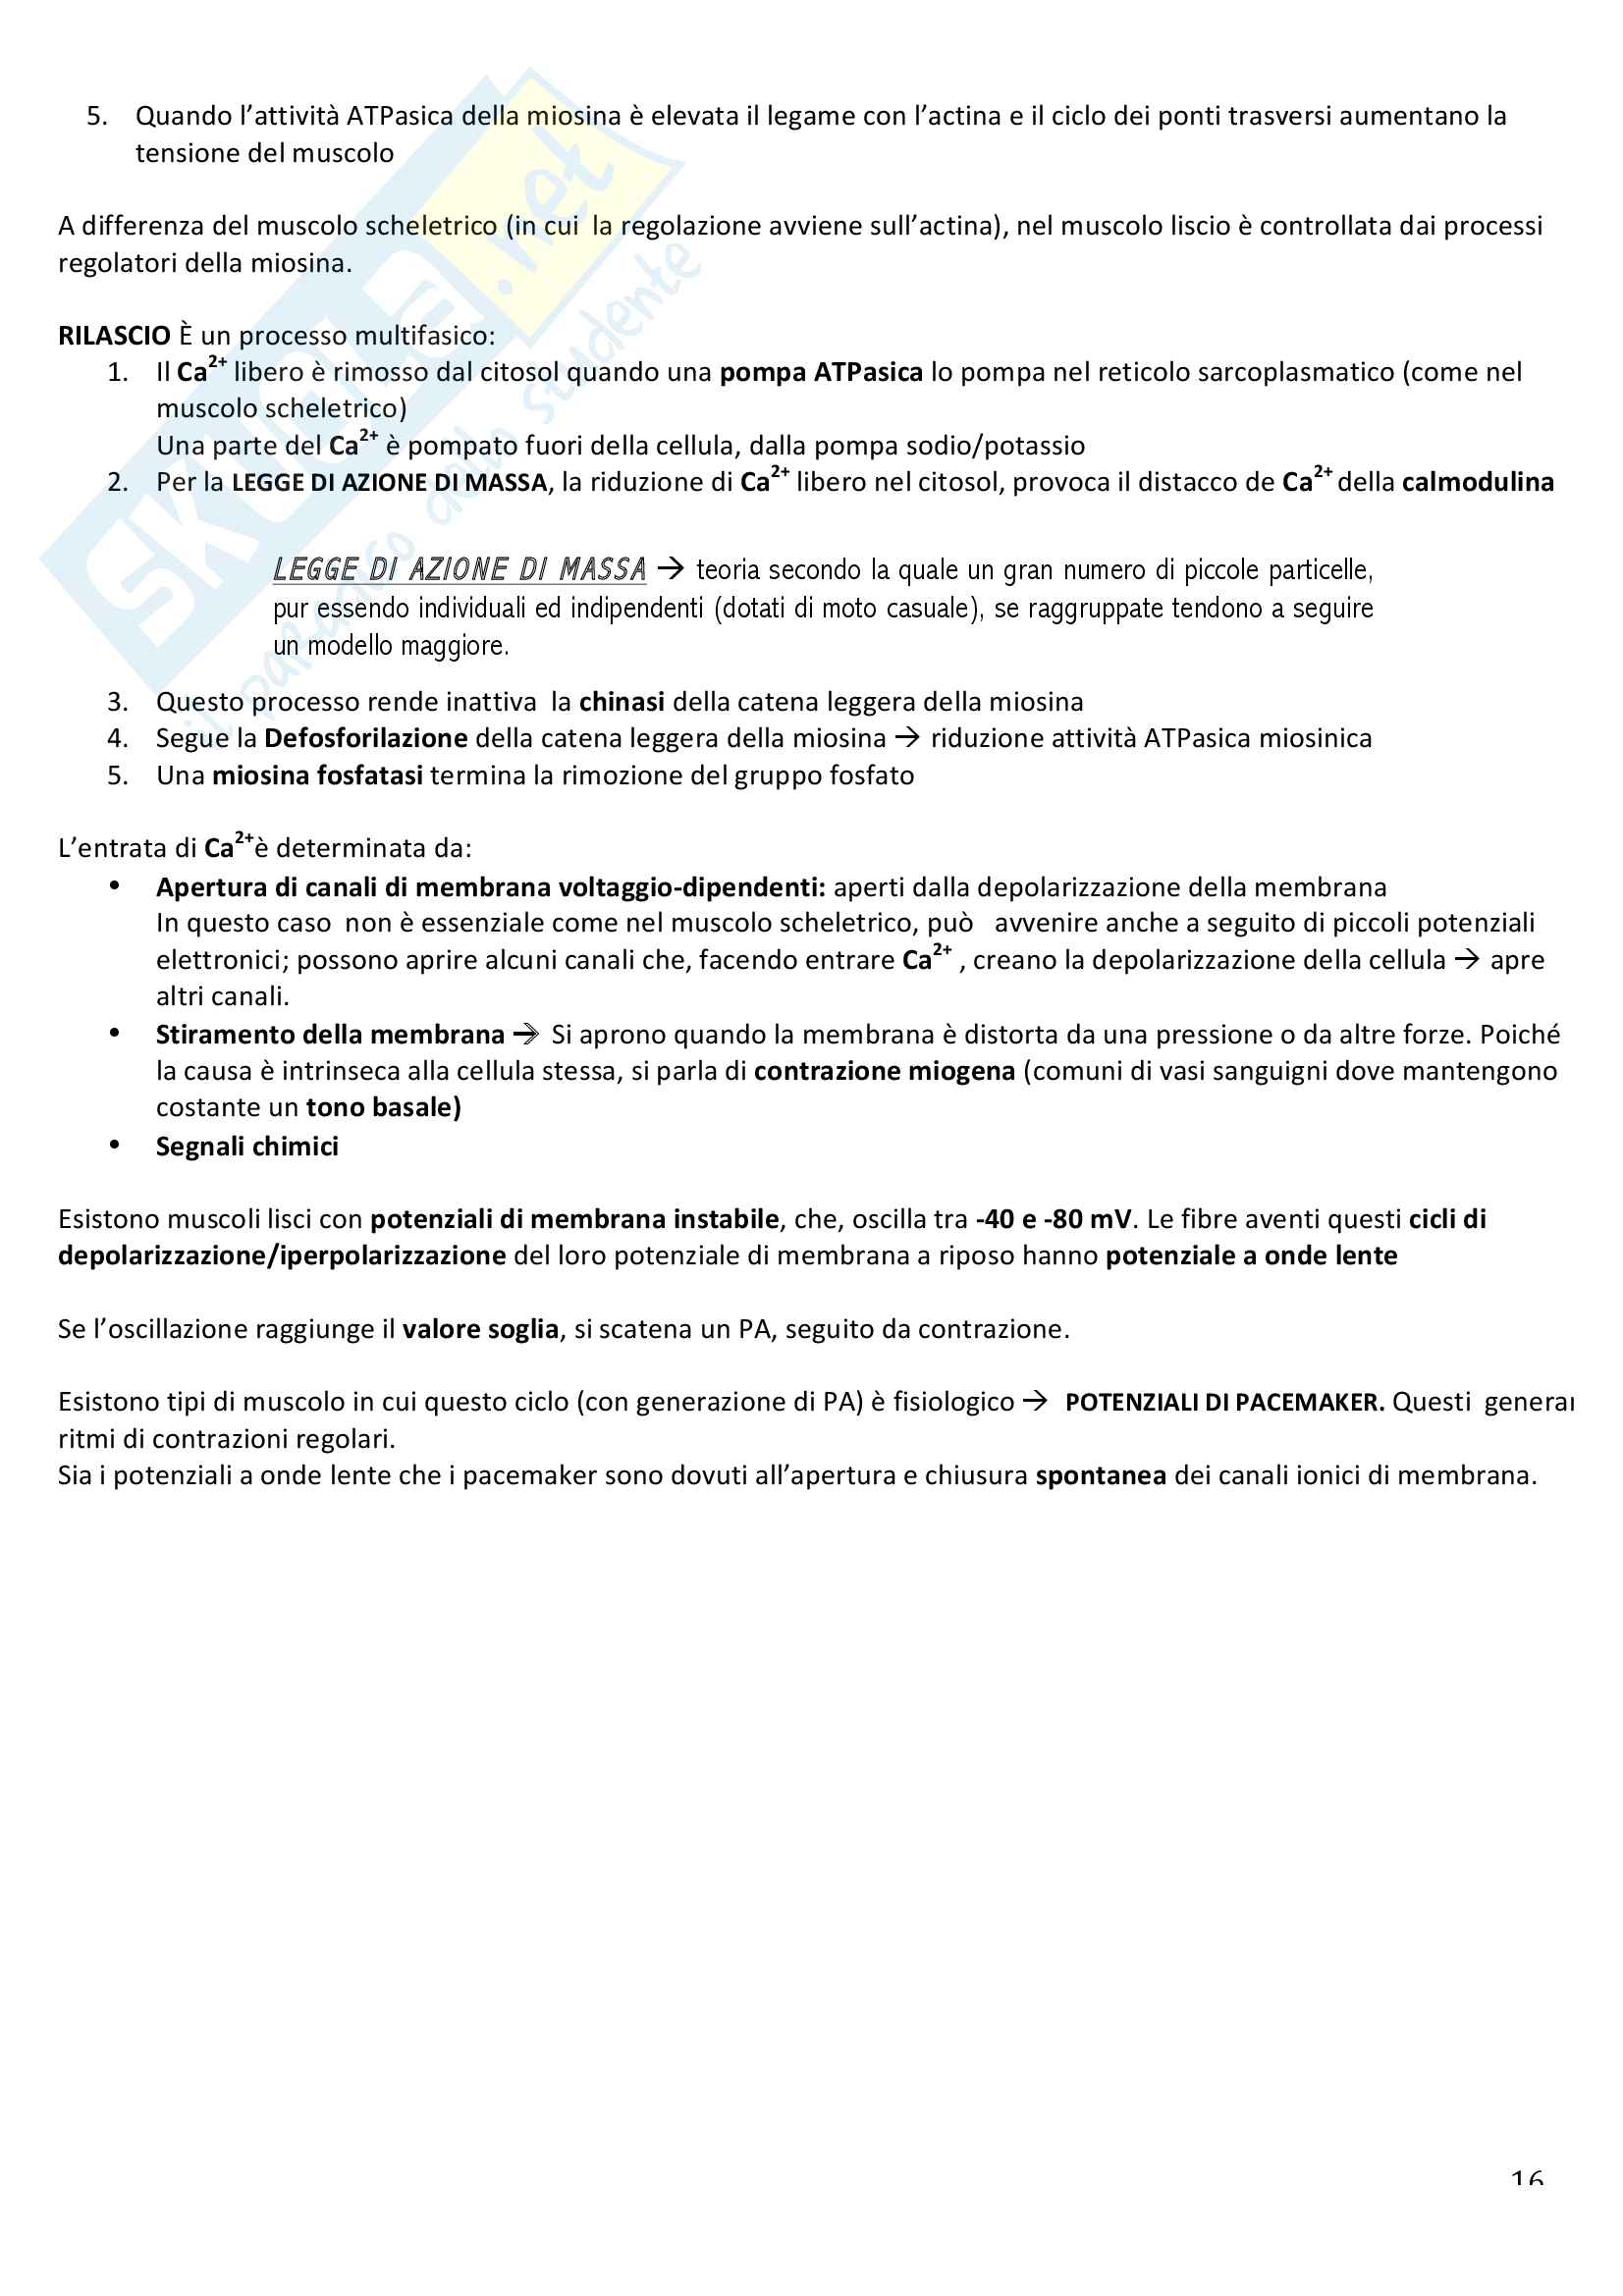 Appunti di fisiologia umana Pag. 16